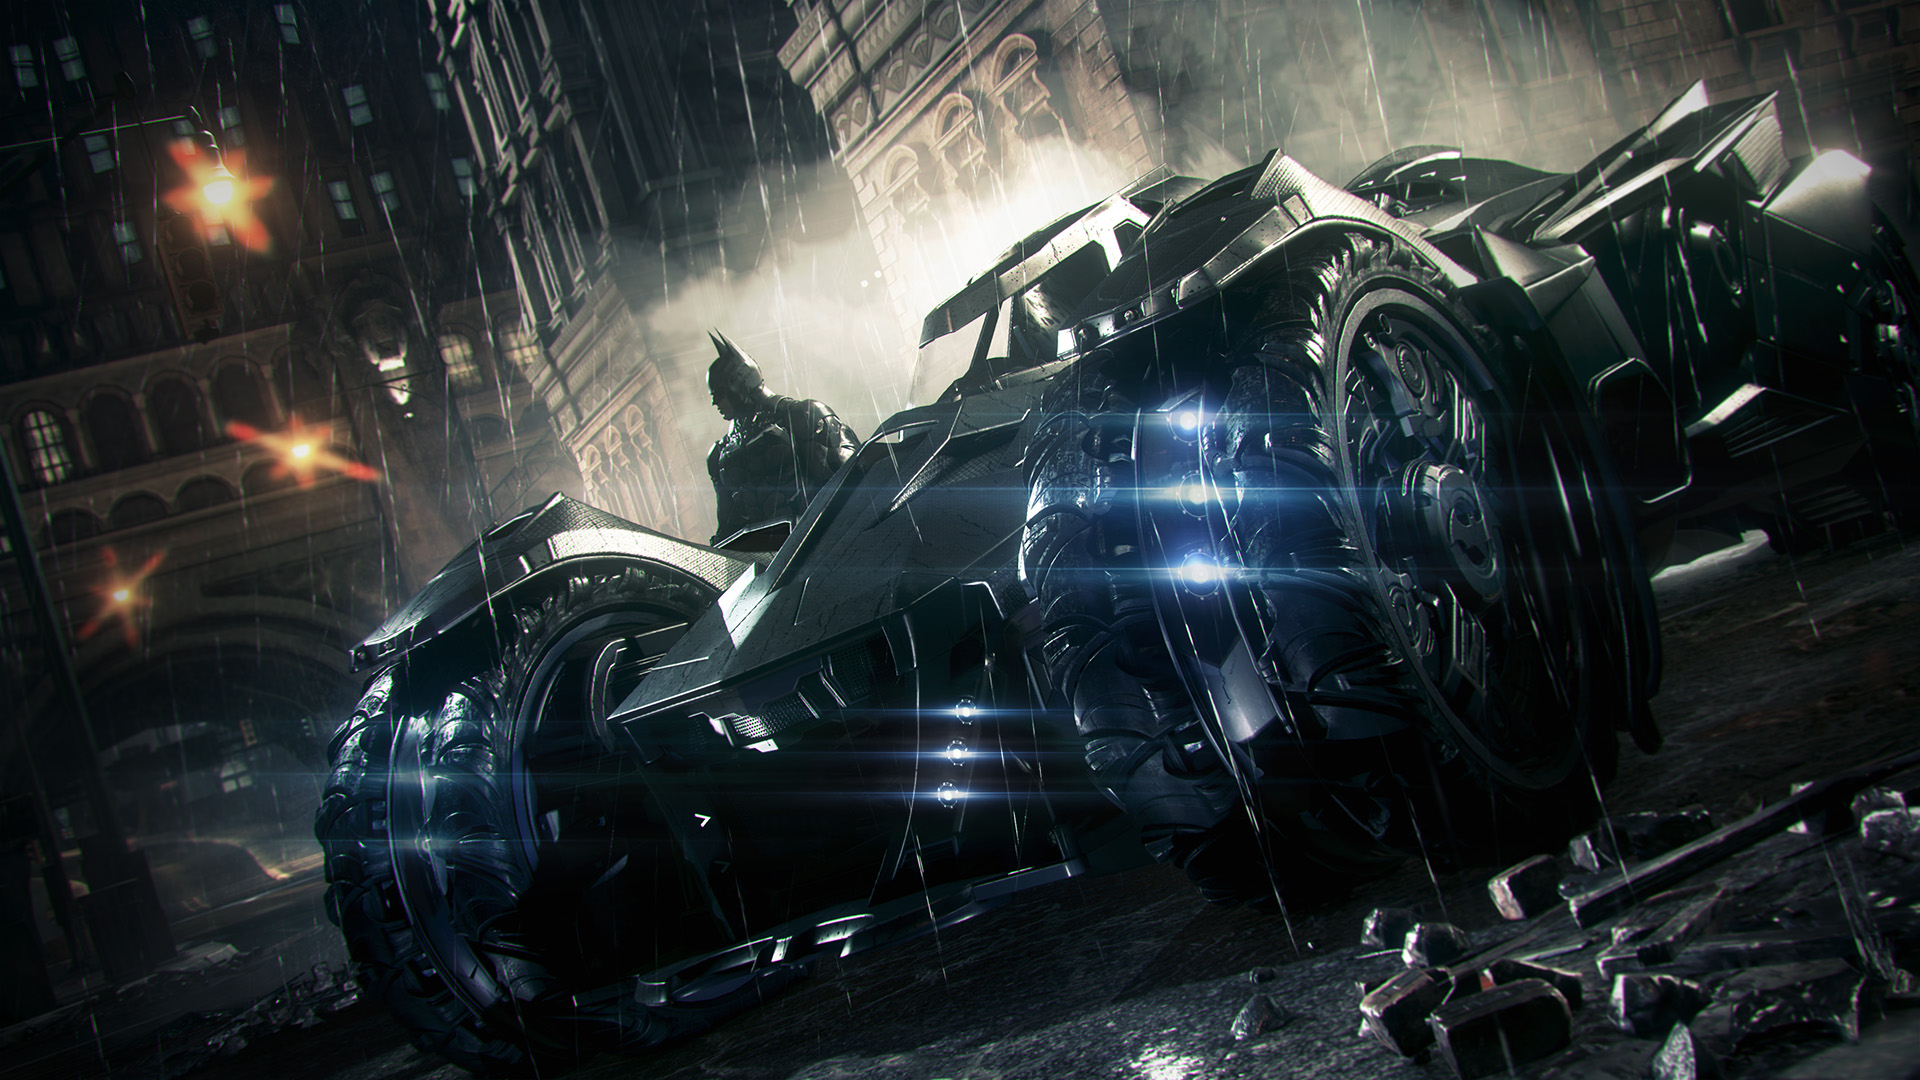 'Batman: Arkham Knight' from Rocksteady